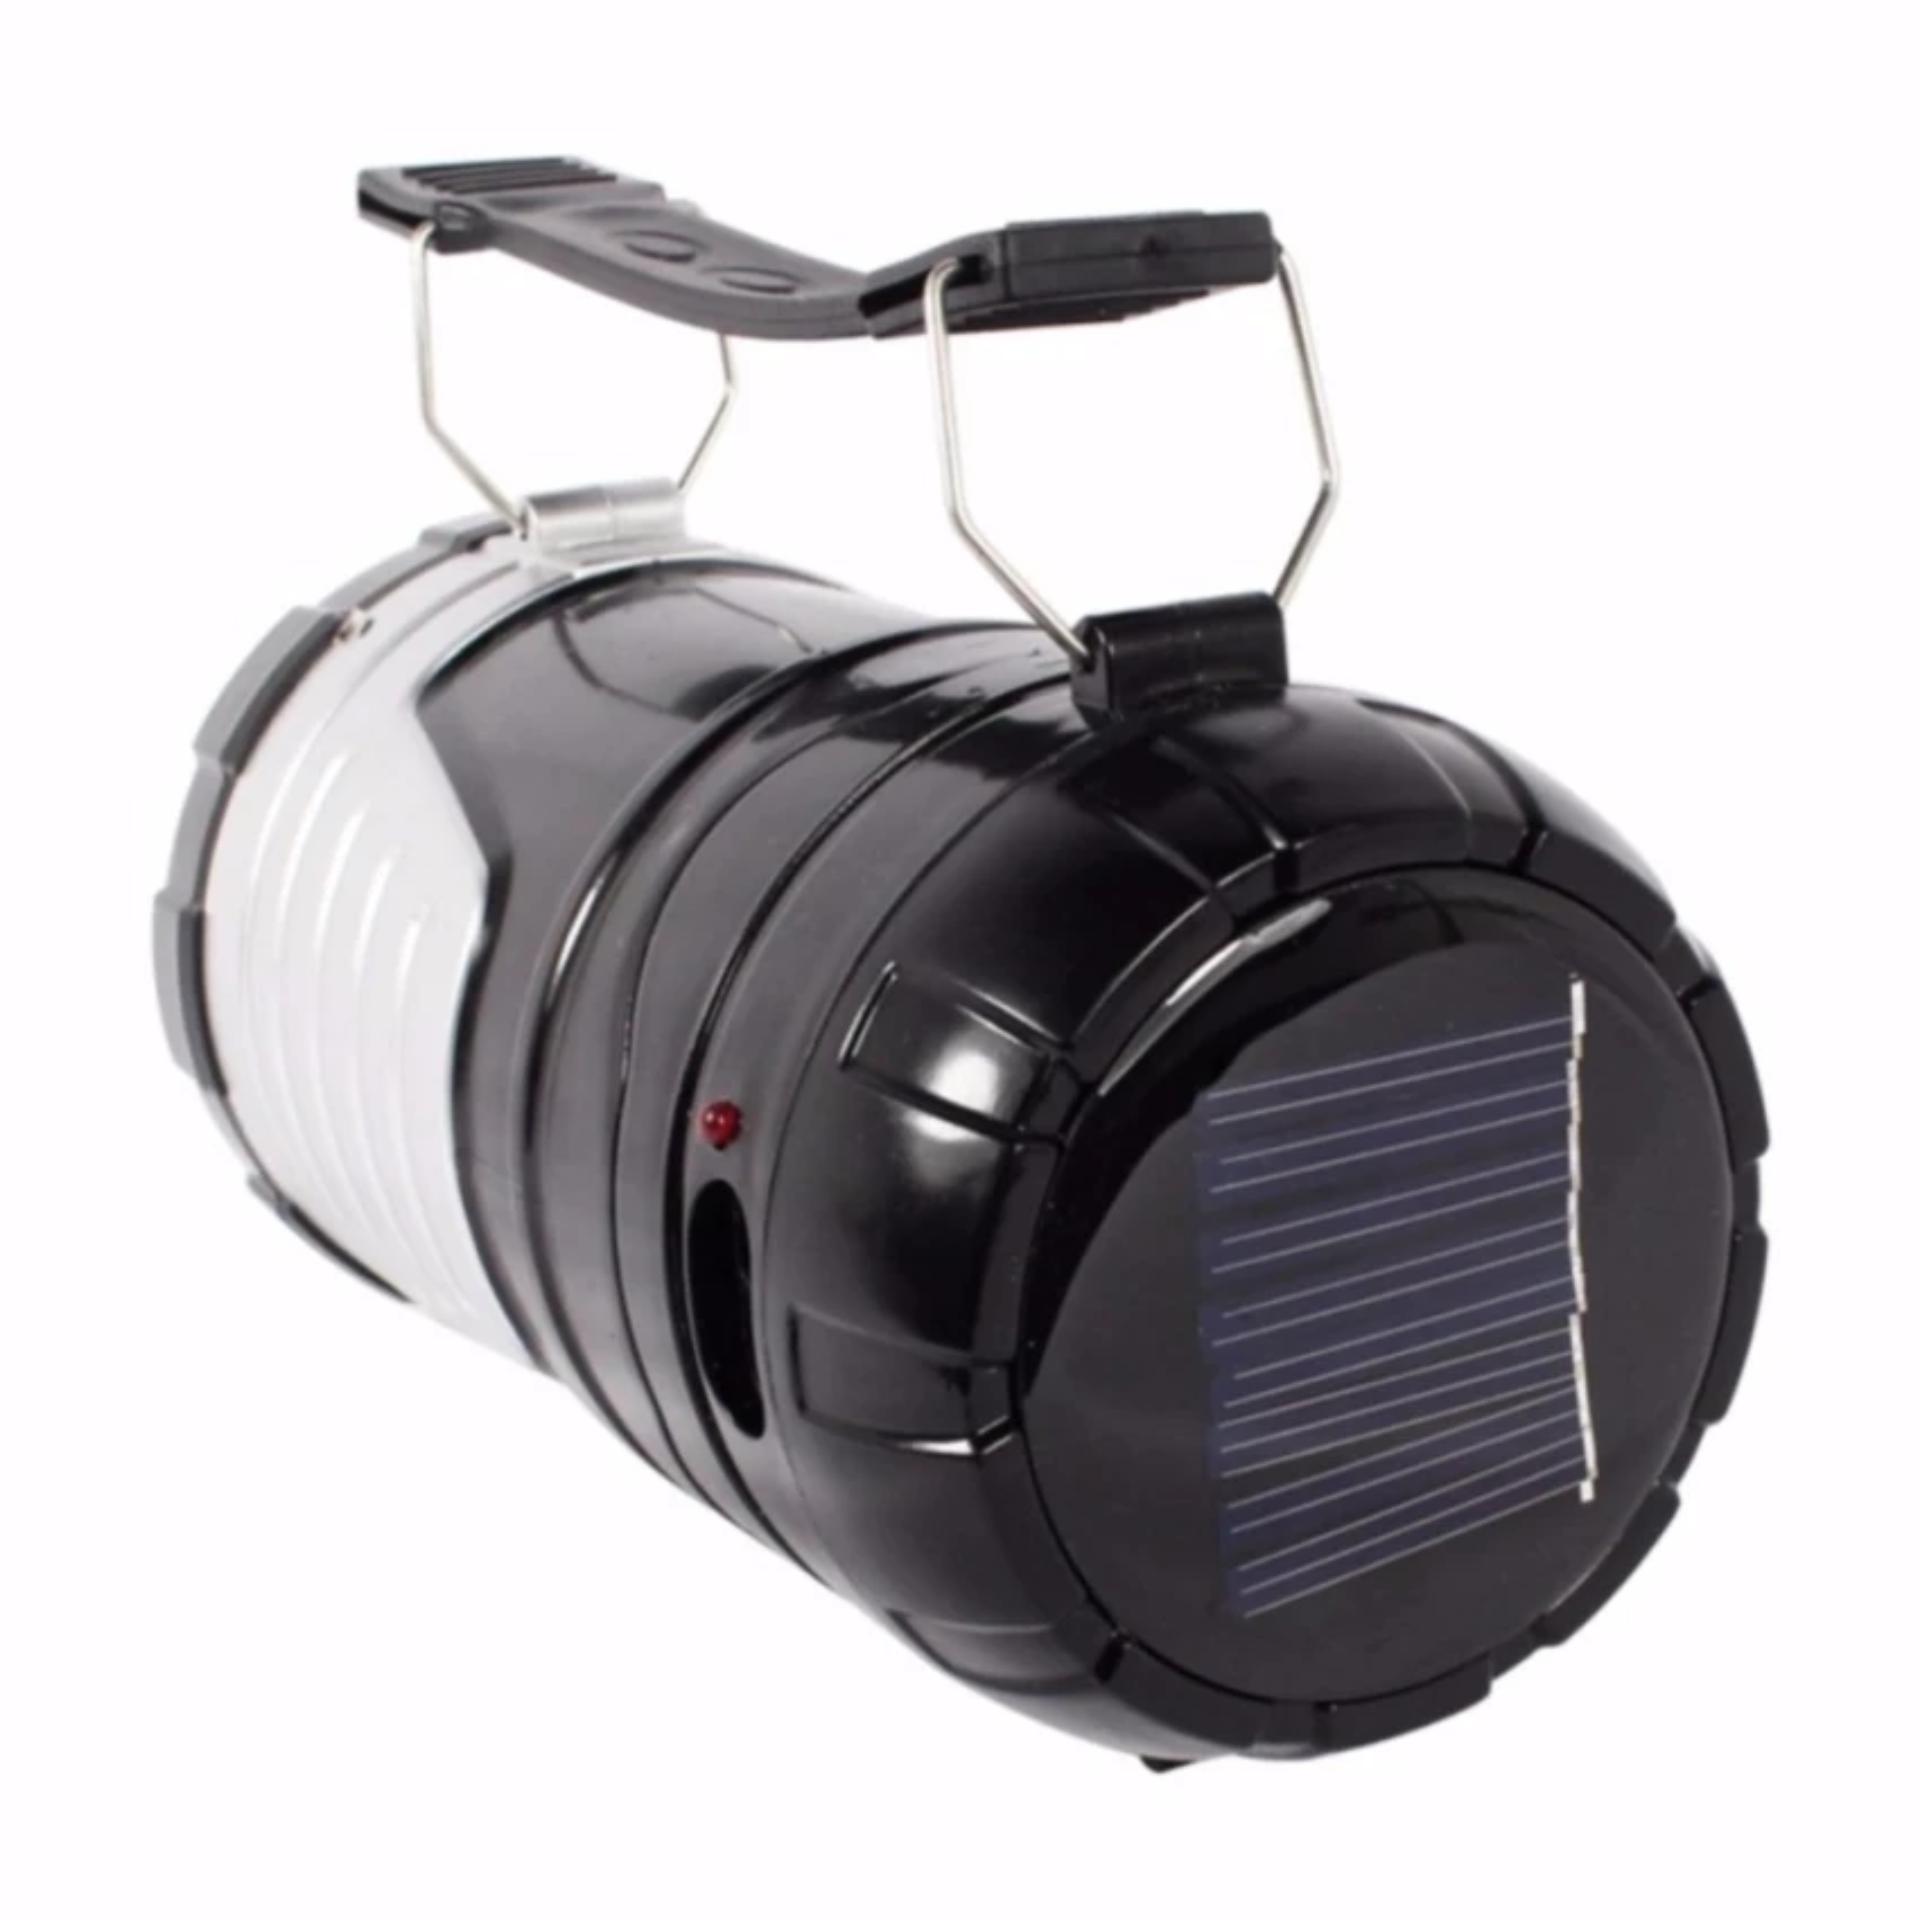 ... Grosir station - Lampu Lentera Camping Solar Plus Senter LED 2 Fungsi Bisa Untuk Powerbank ...